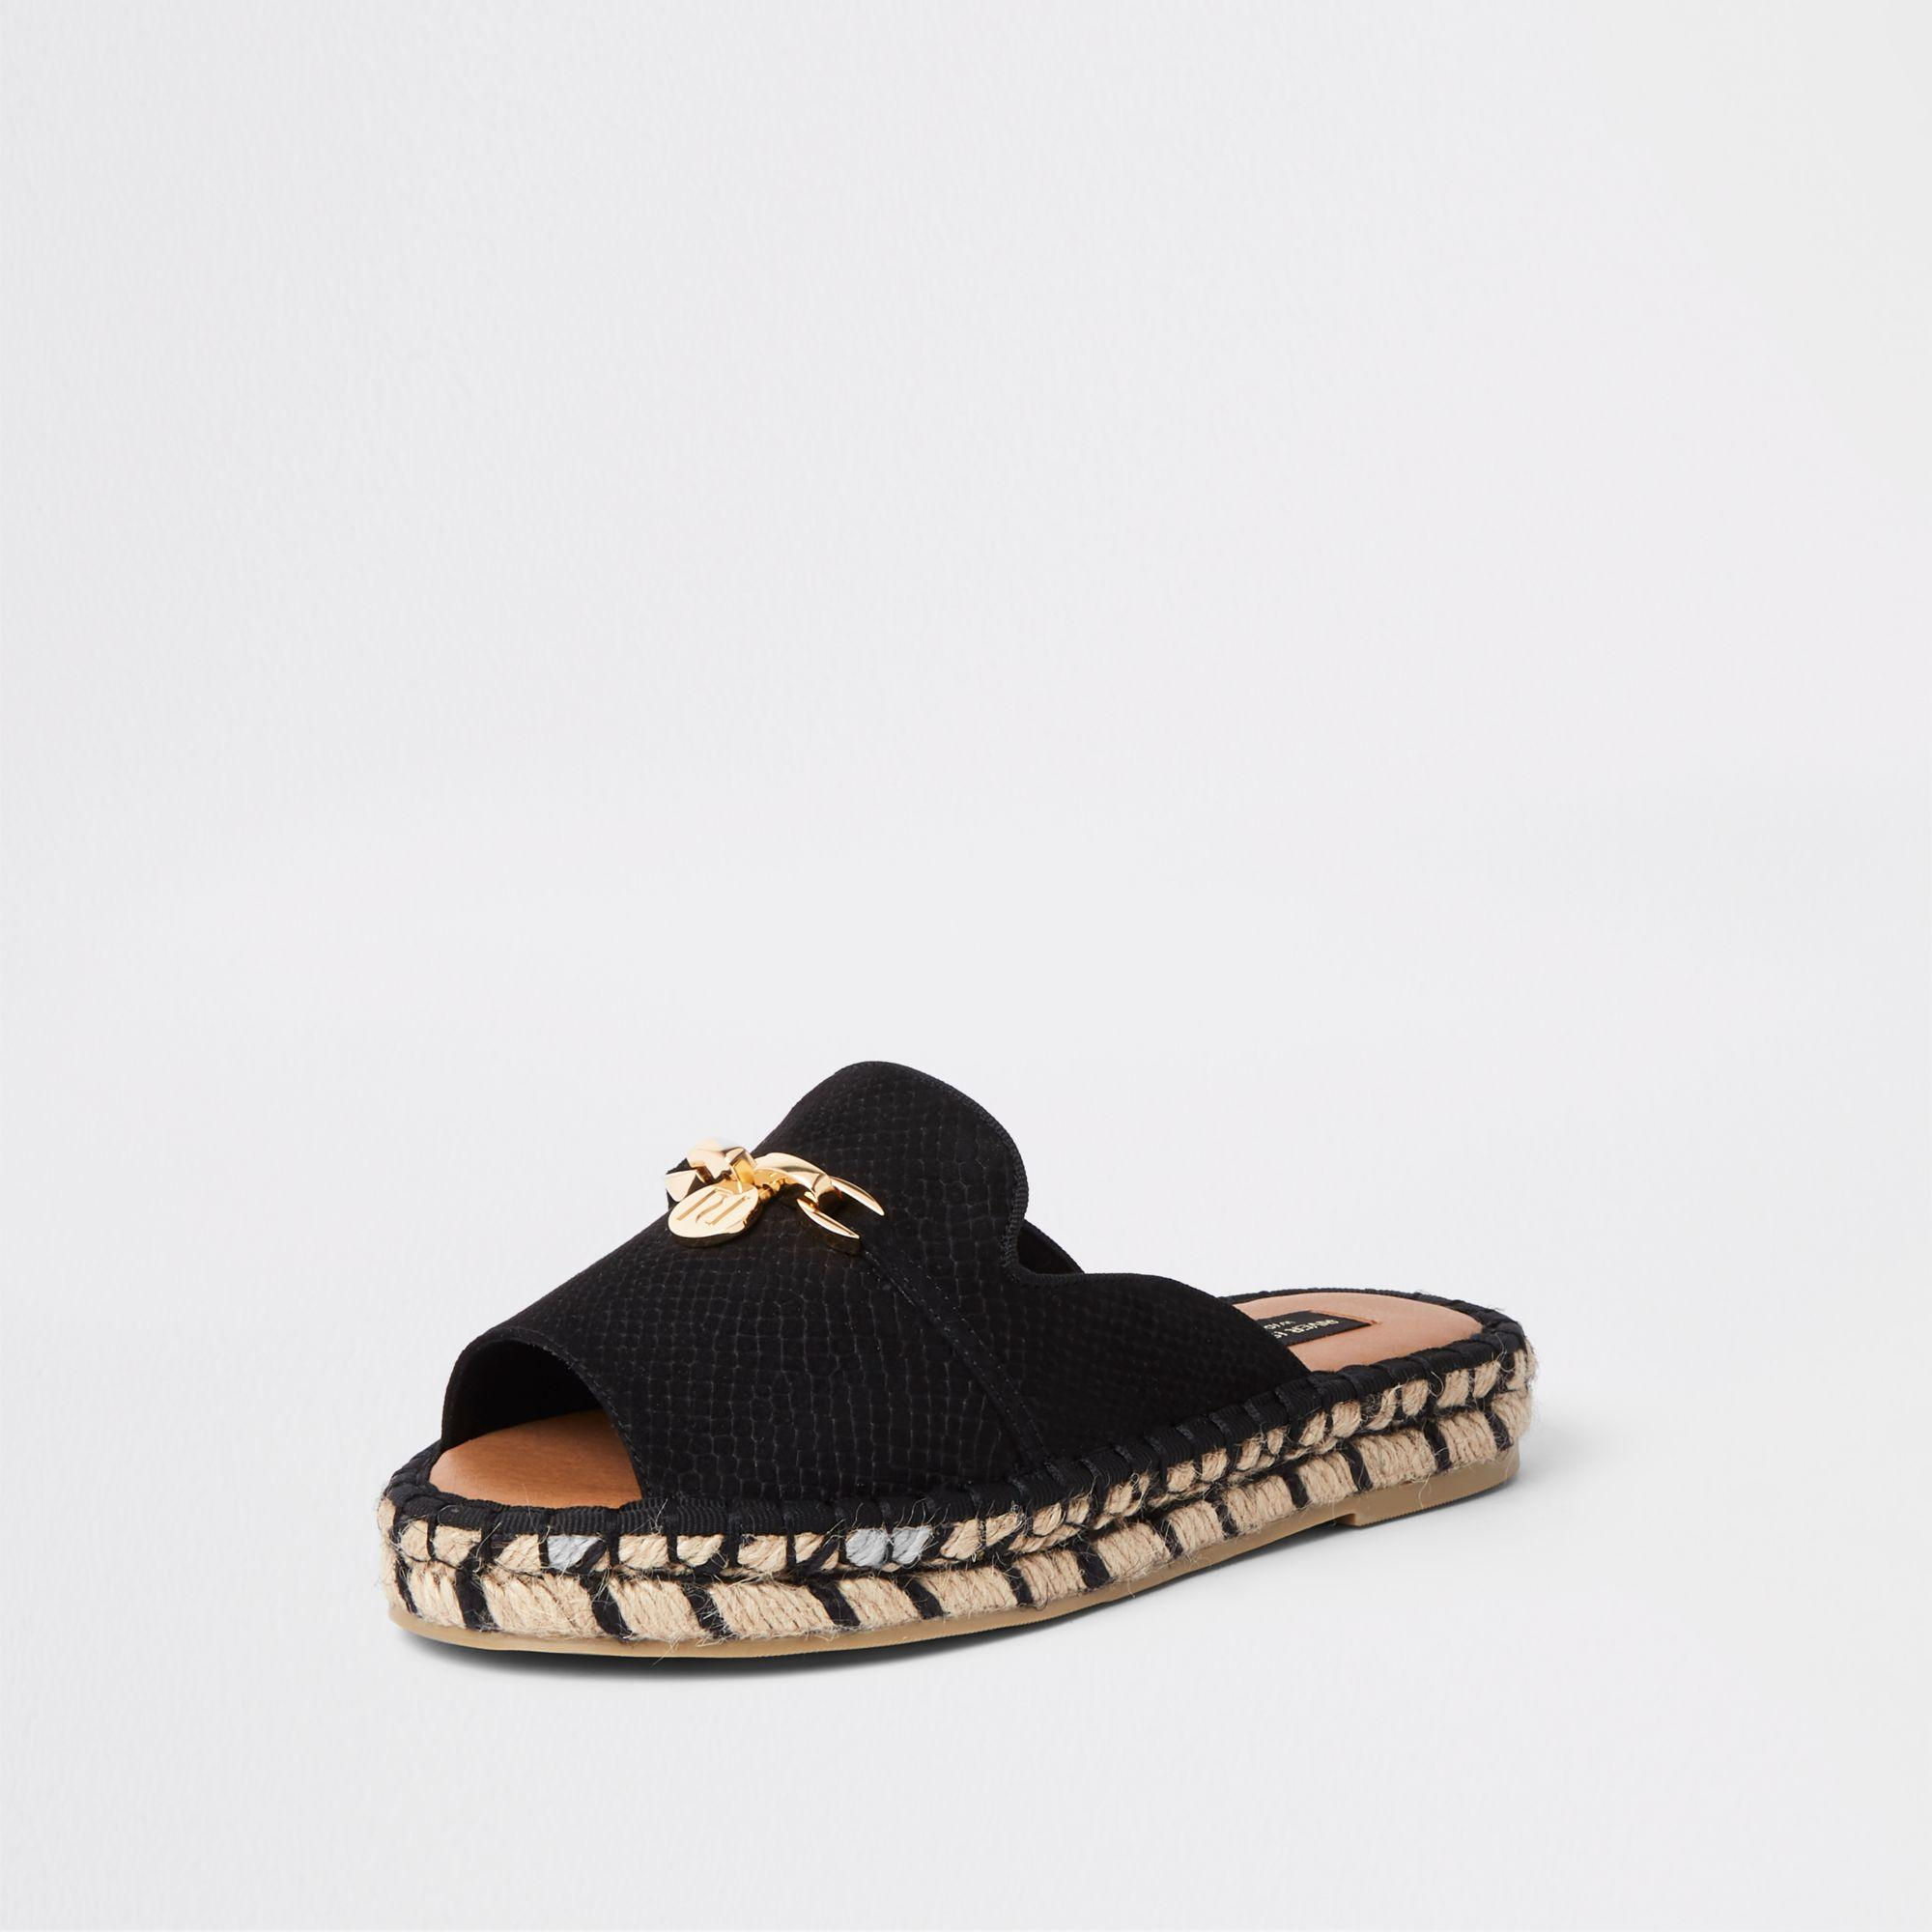 4da89a1d1f0 River Island - Black Espadrille Peep Toe Wide Fit Sandals - Lyst. View  fullscreen